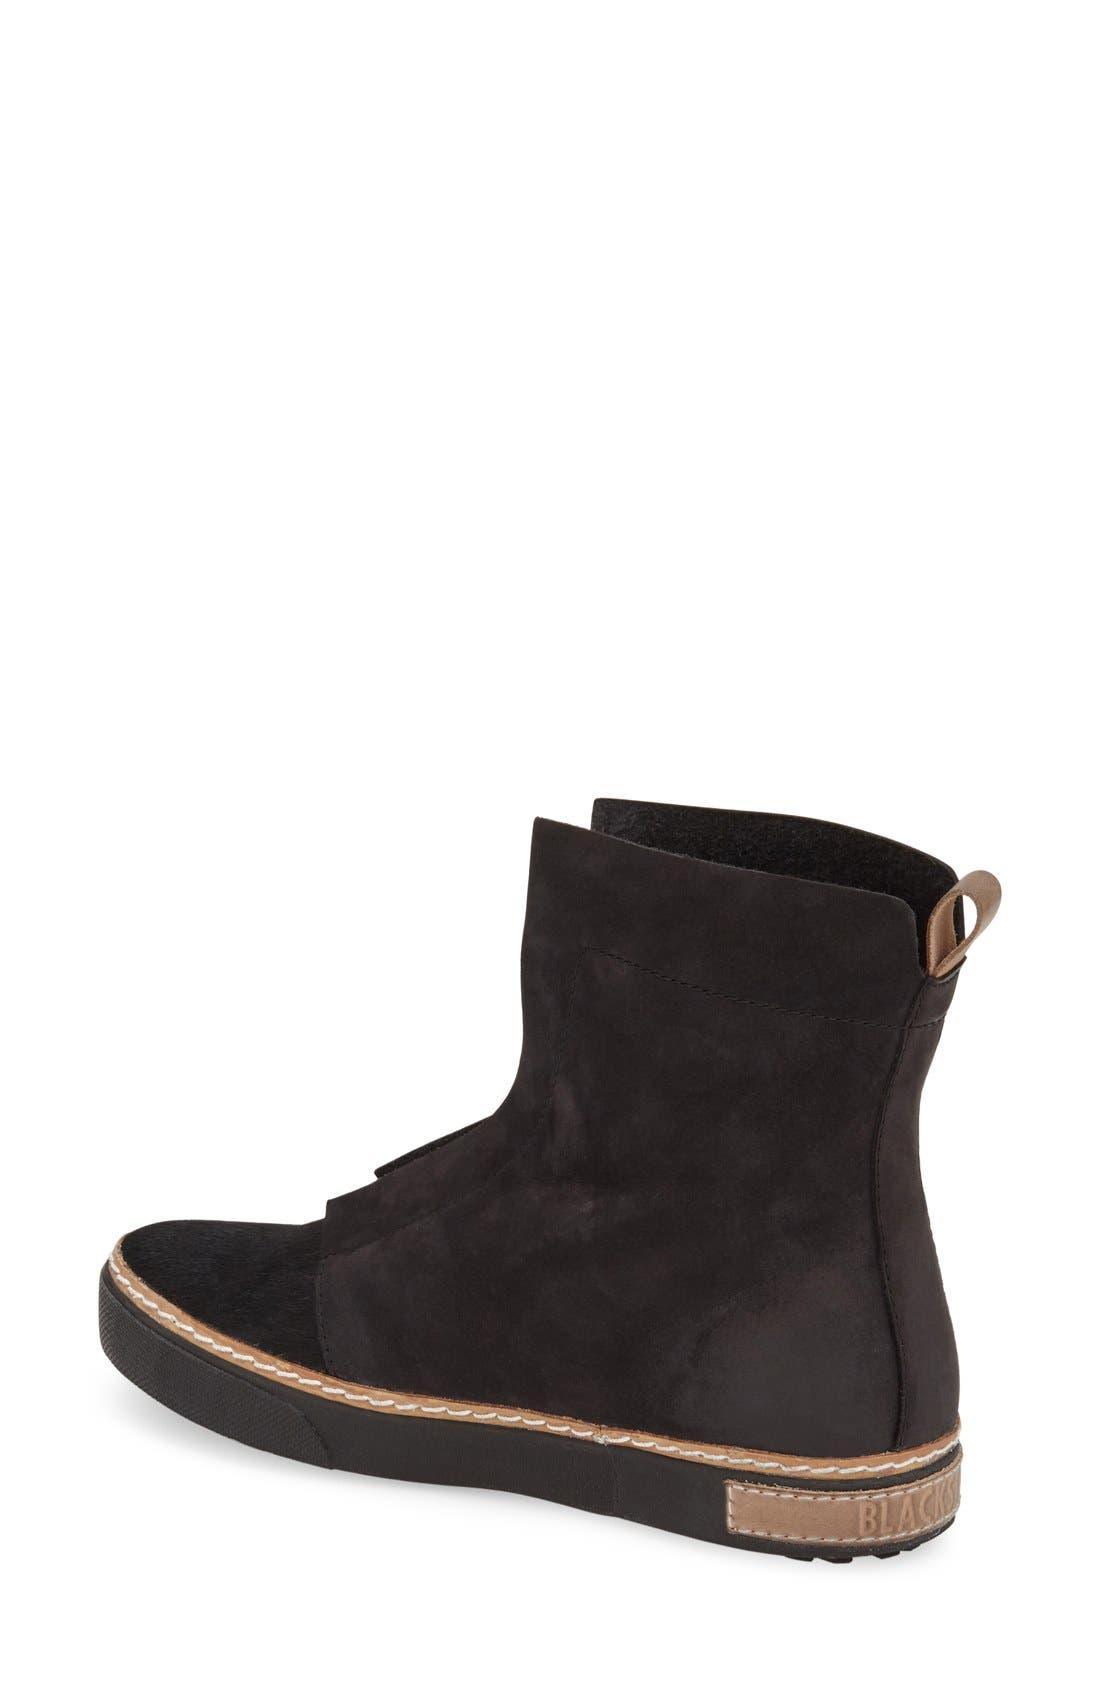 Genuine Calf Hair Zip Chukka Boot,                             Alternate thumbnail 2, color,                             Black Leather